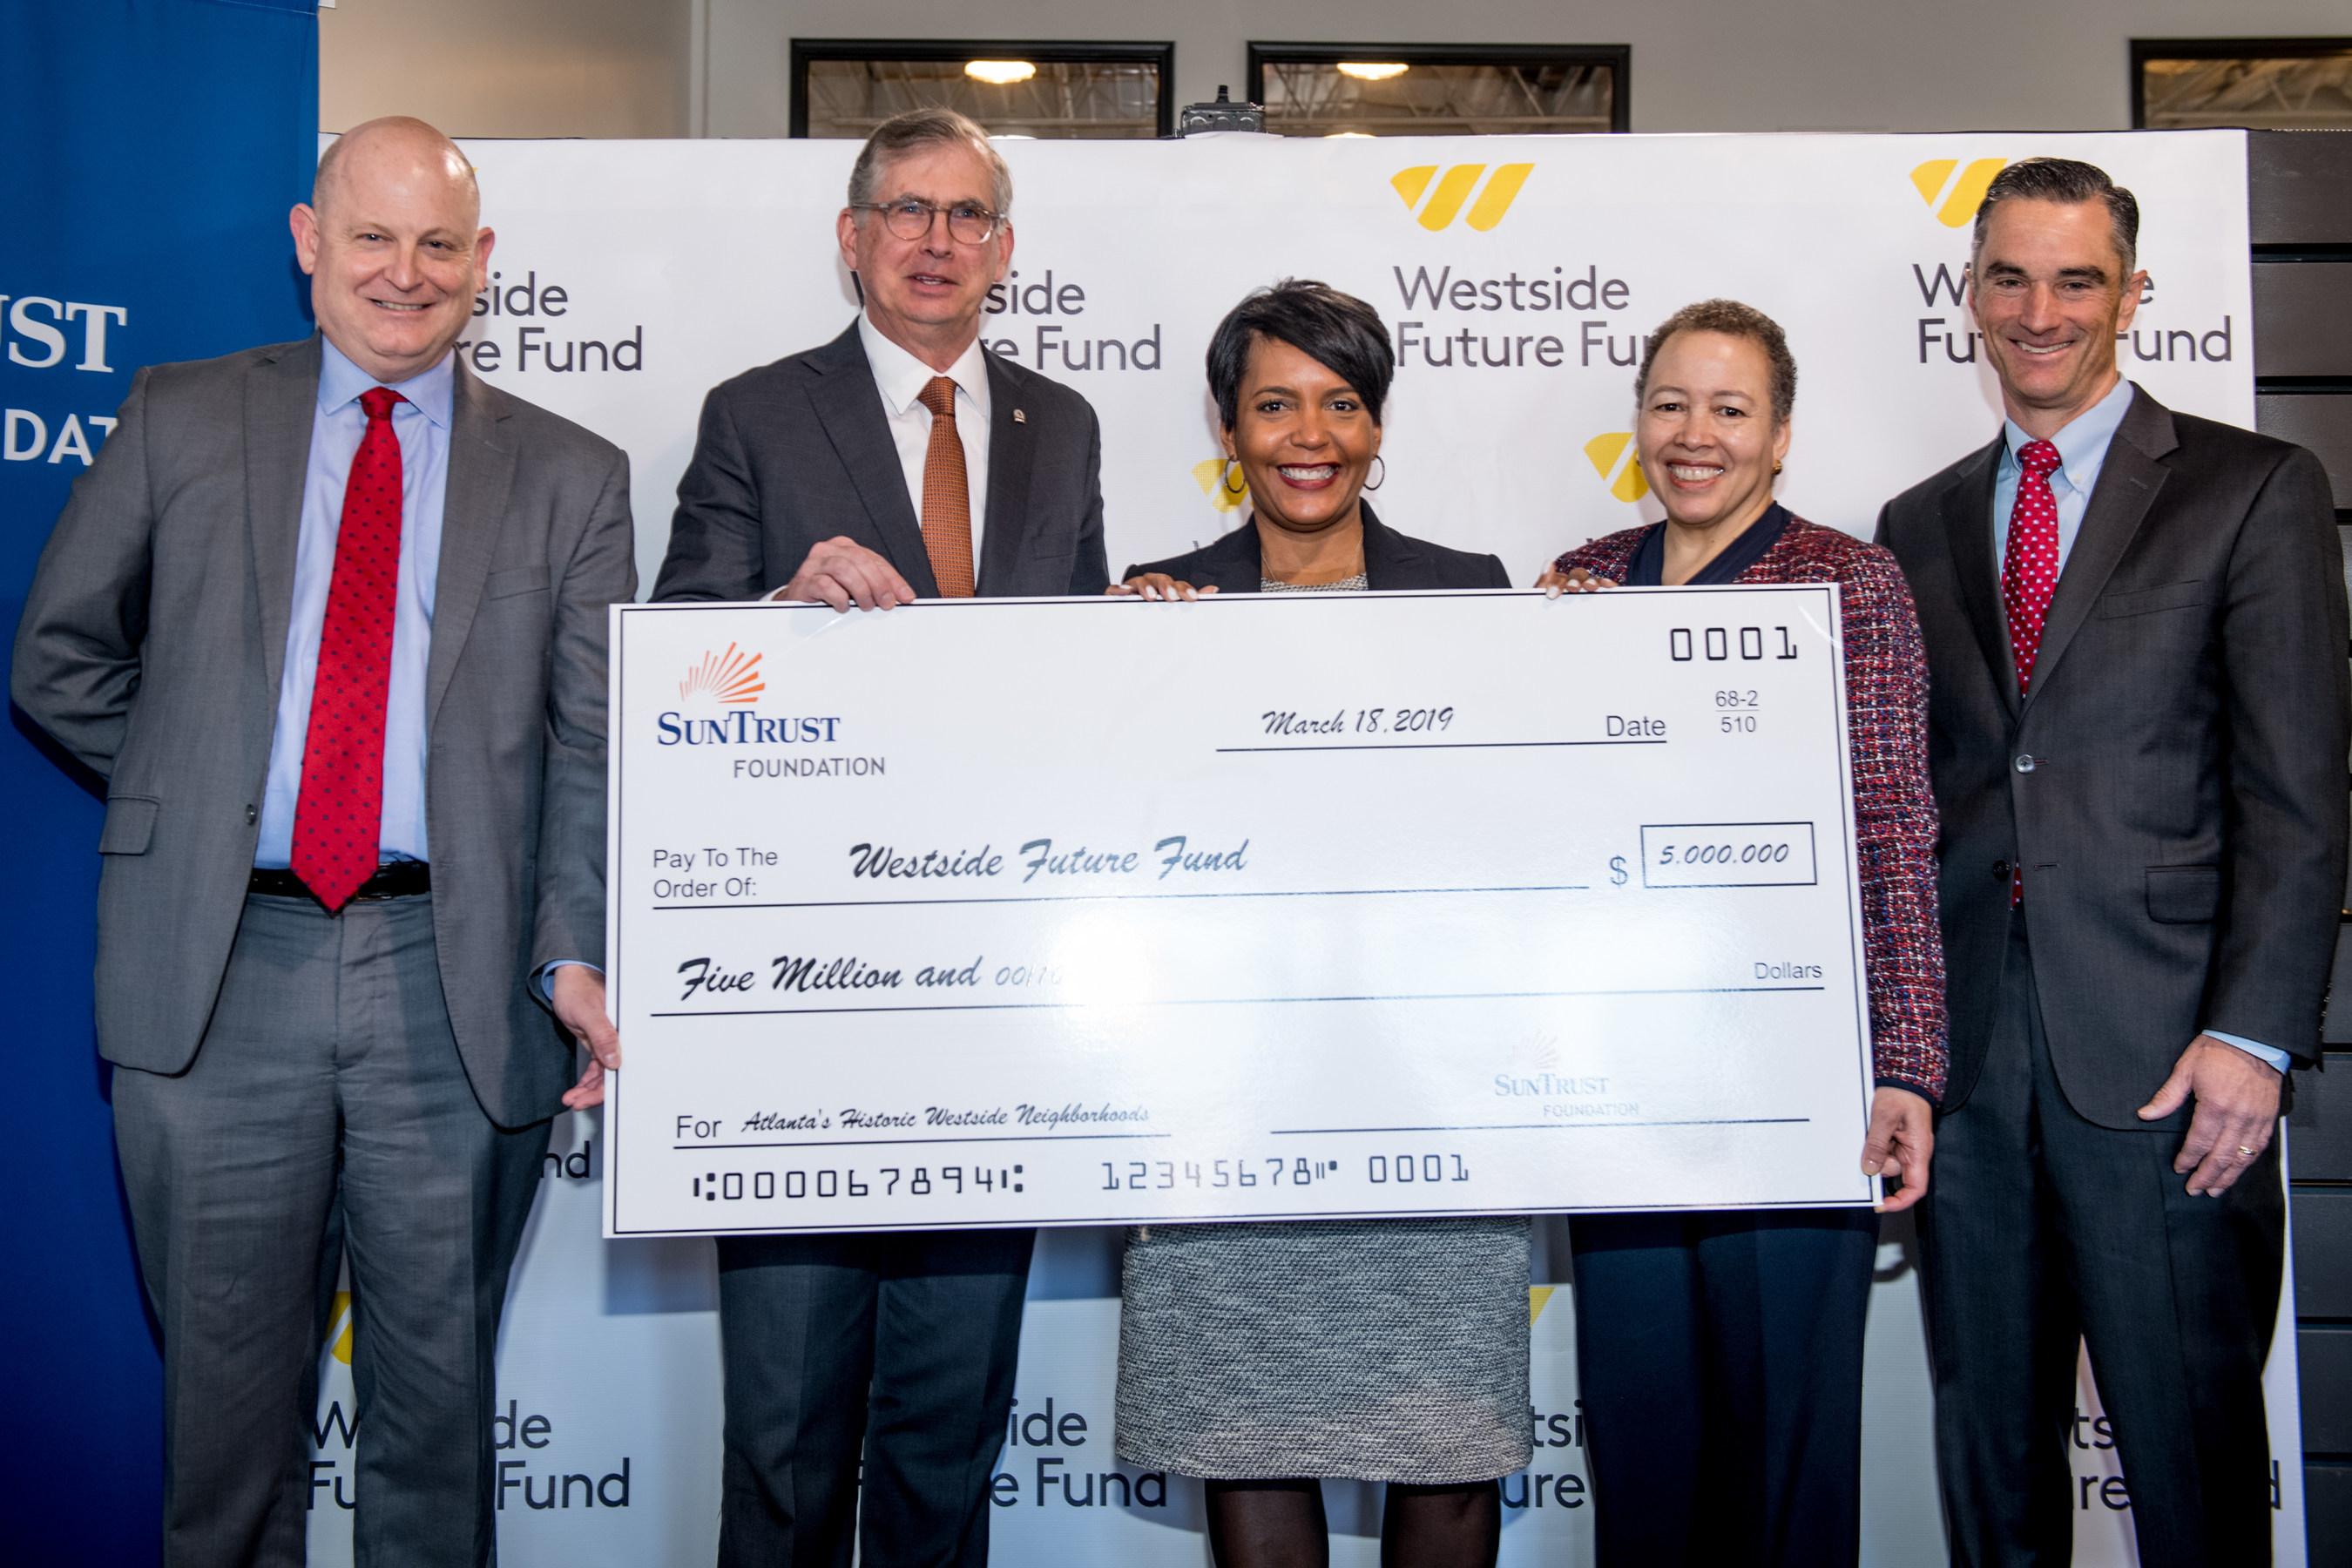 SunTrust Foundation Awards $5 Million Grant to Westside